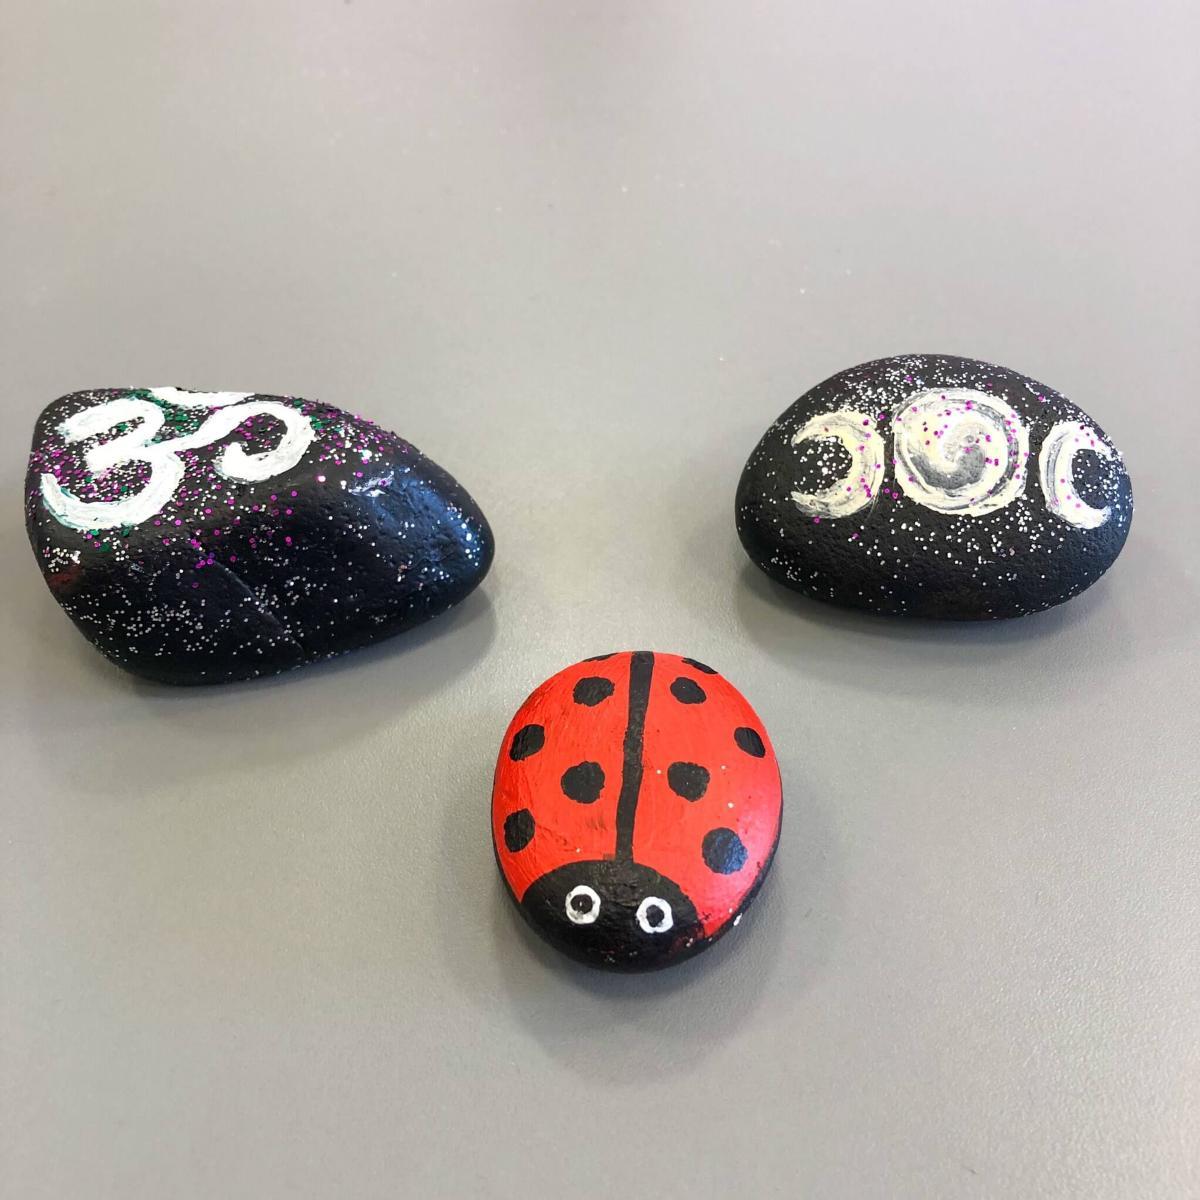 Redwood 2 pebbles